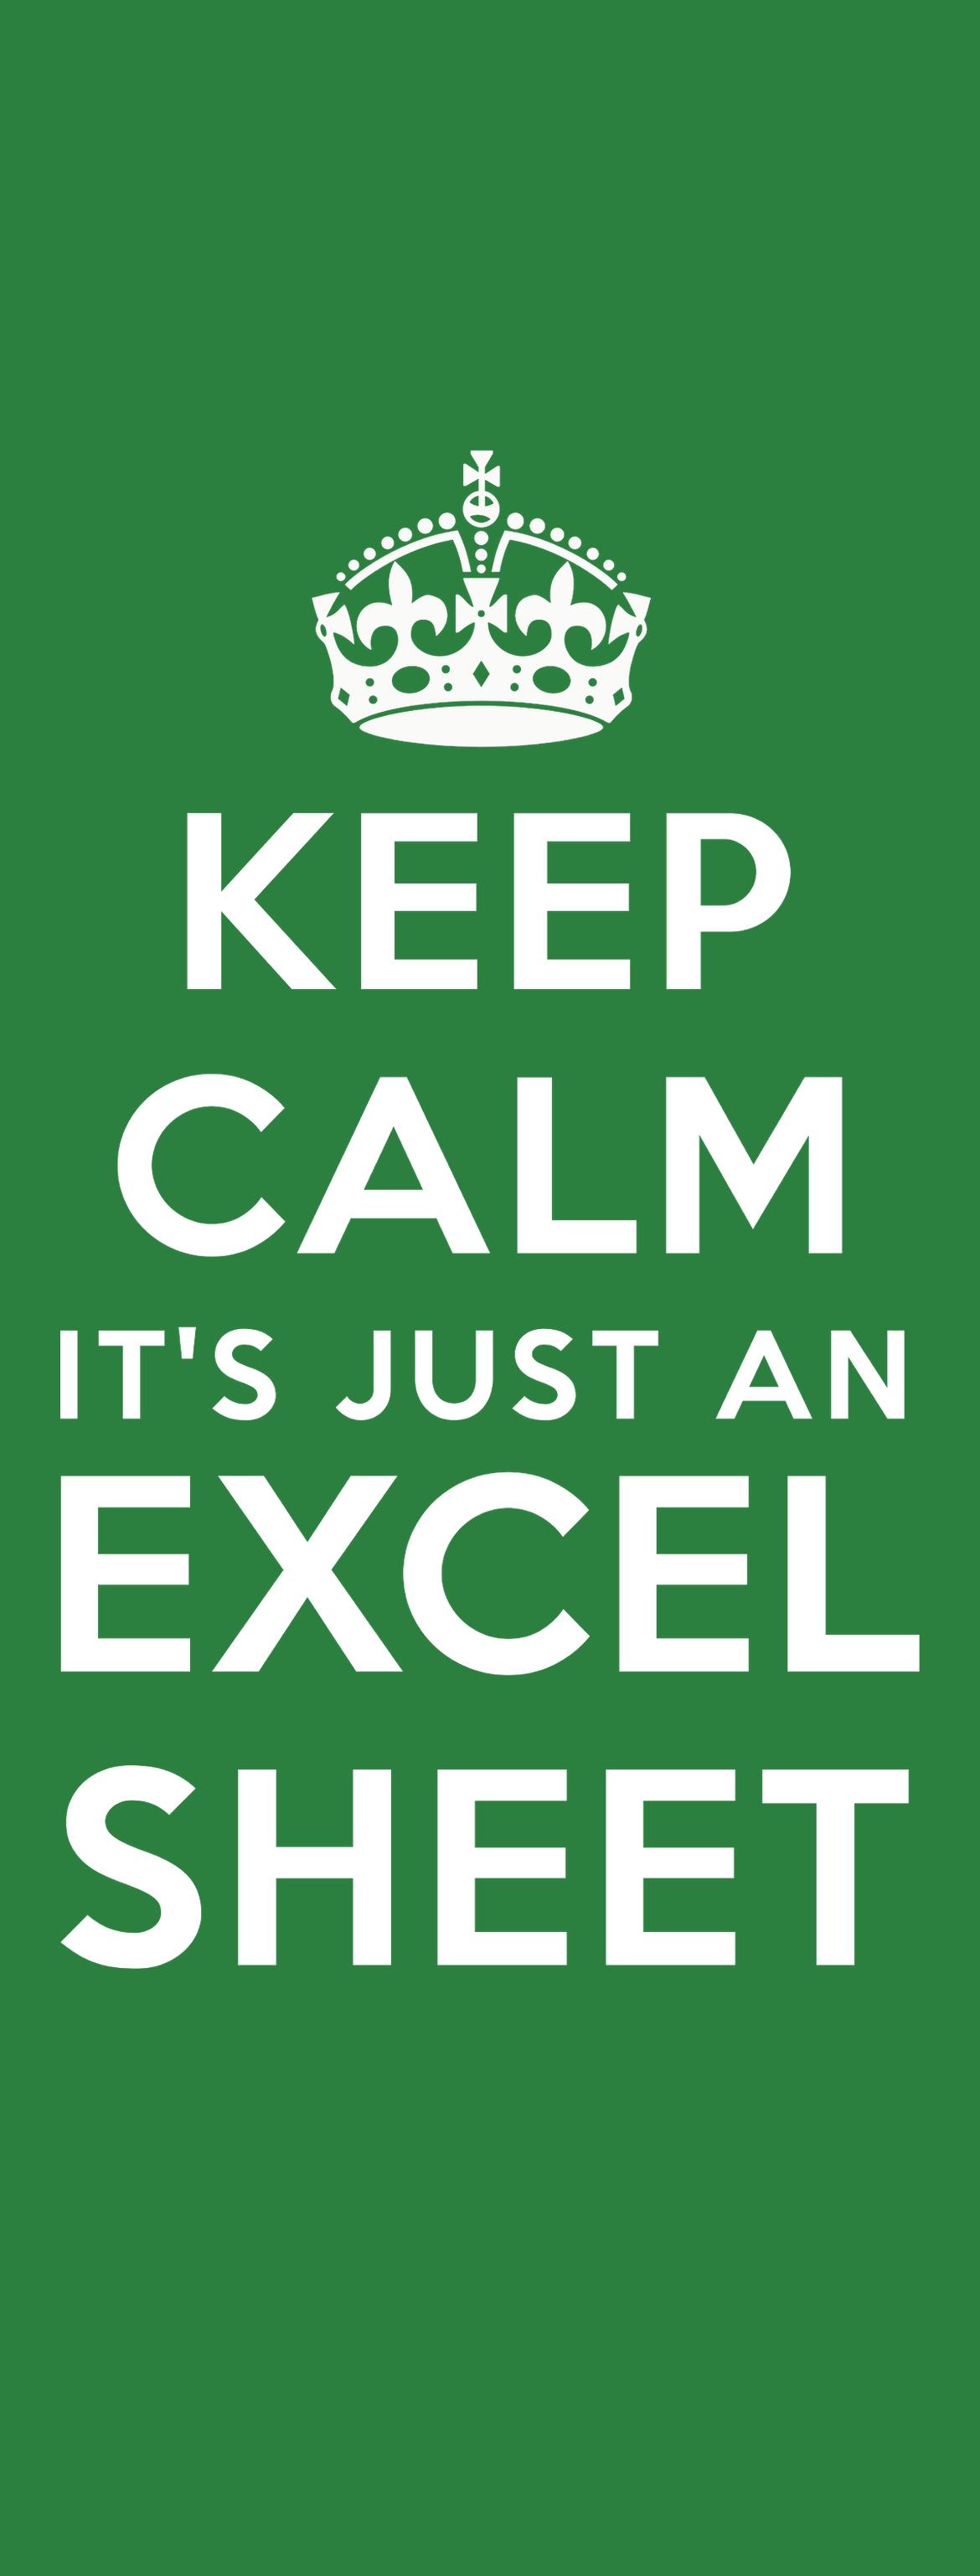 Wallpaper Excel Keep Calm 3